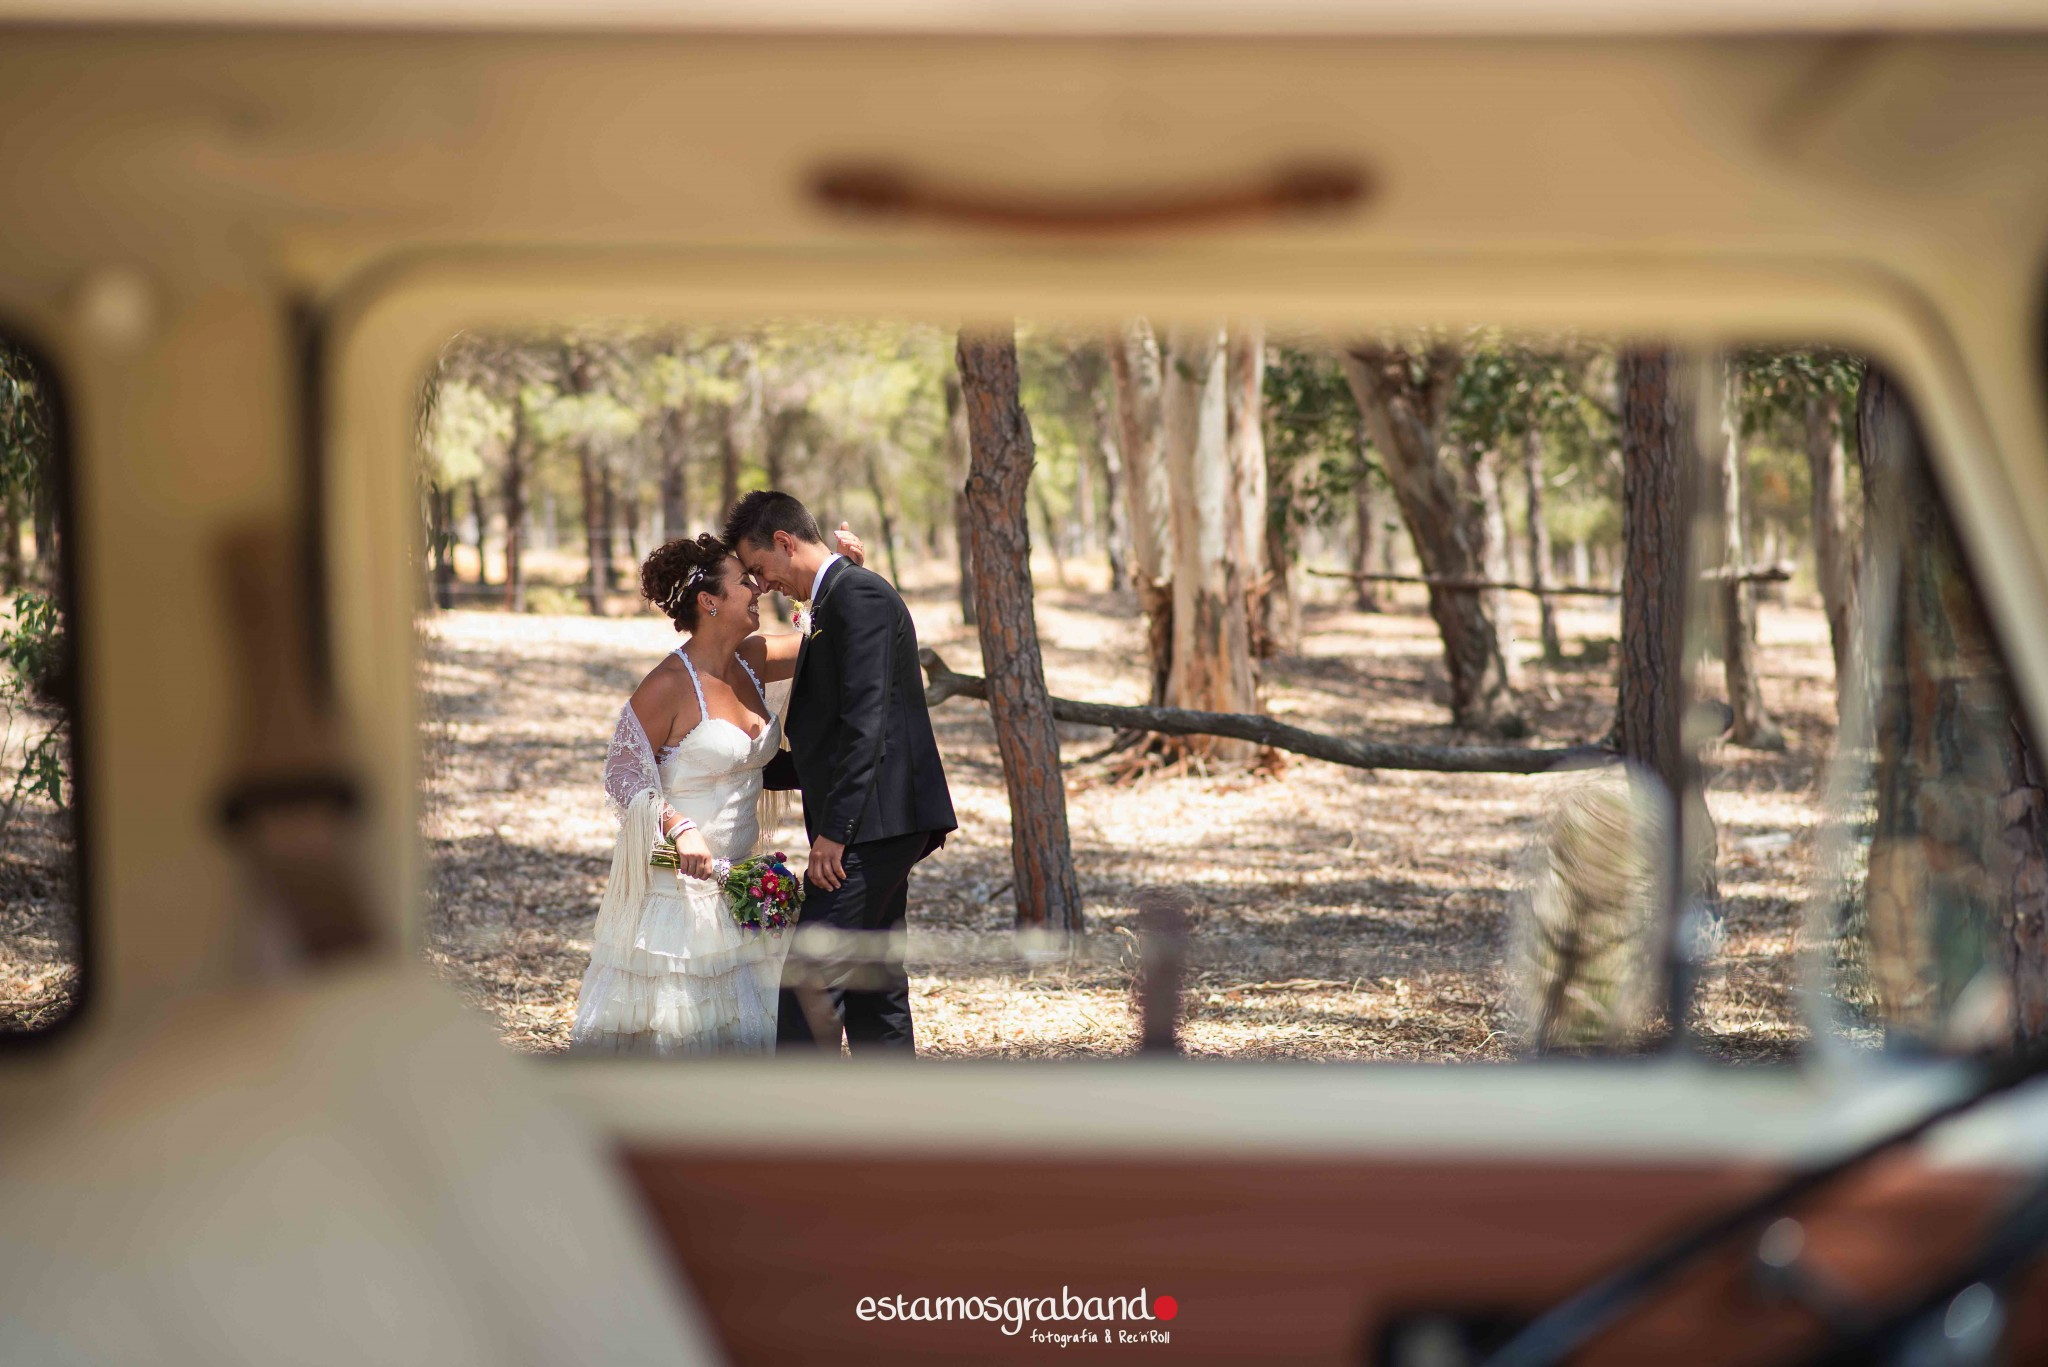 pili-y-jose_fotograficc81a-cadiz-72 Pili & Jose - video boda cadiz